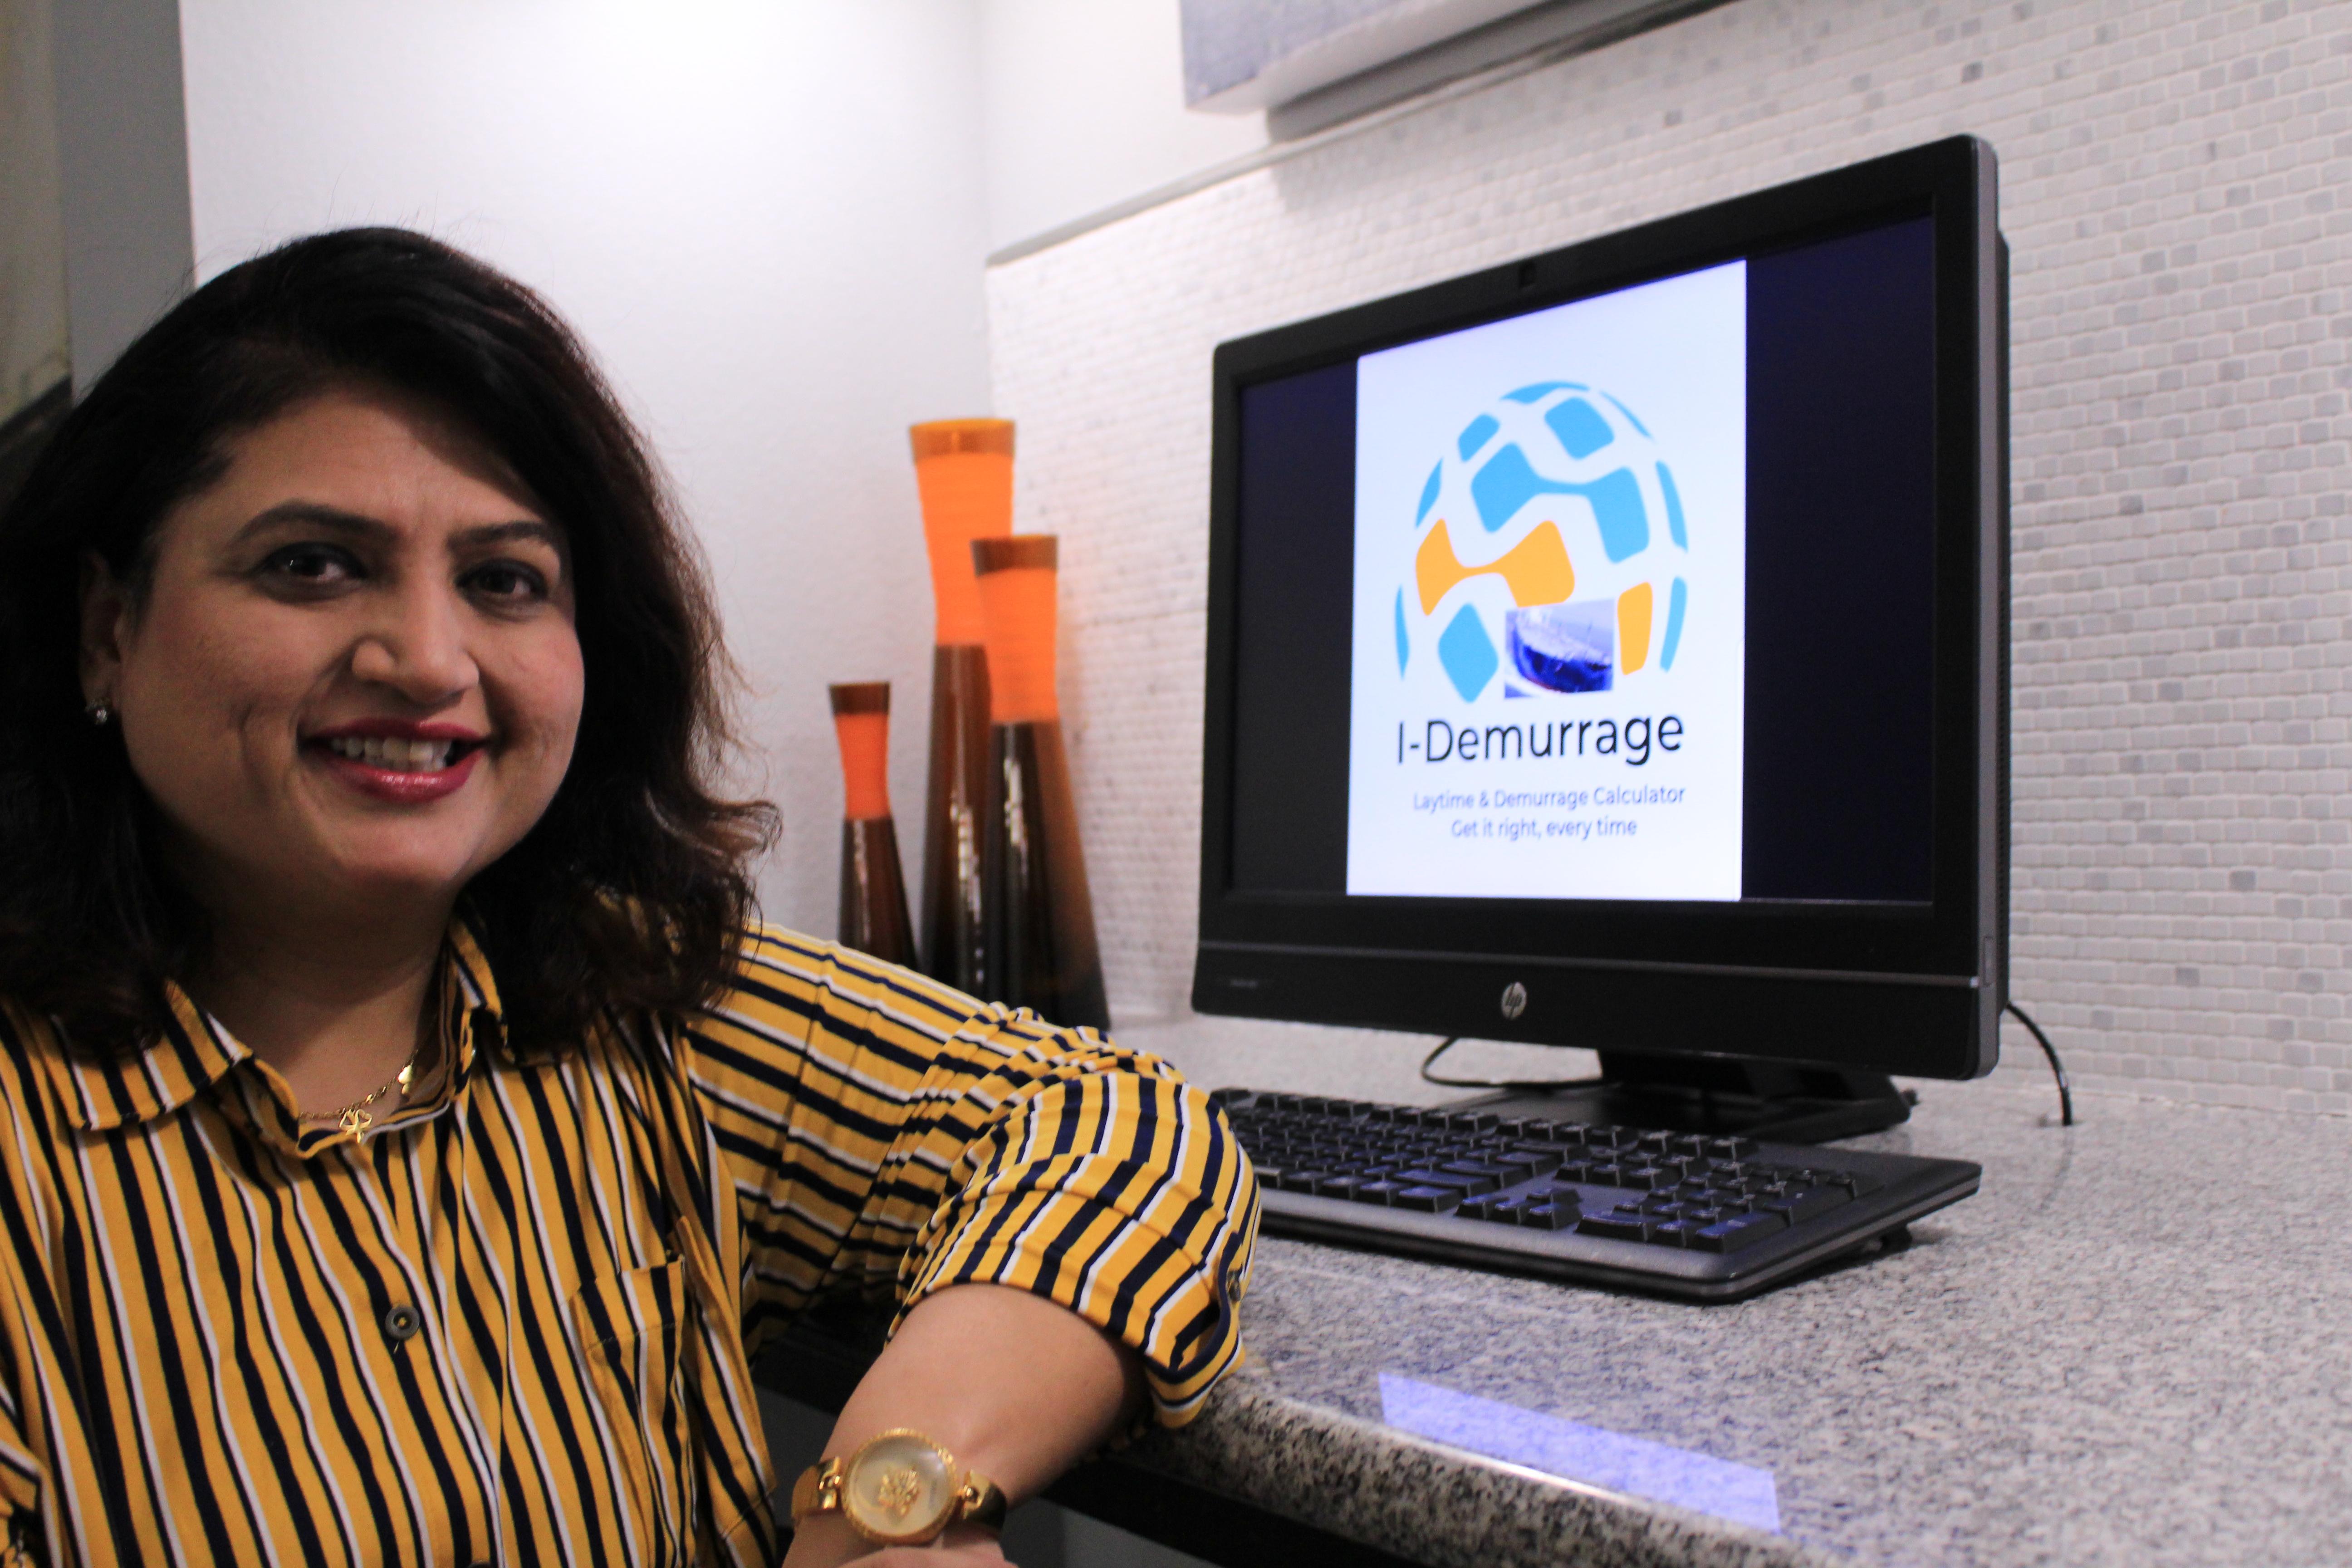 Leena Asher, the brain behind the I-Demurrage app, is a Specialist Demurrage Analyst